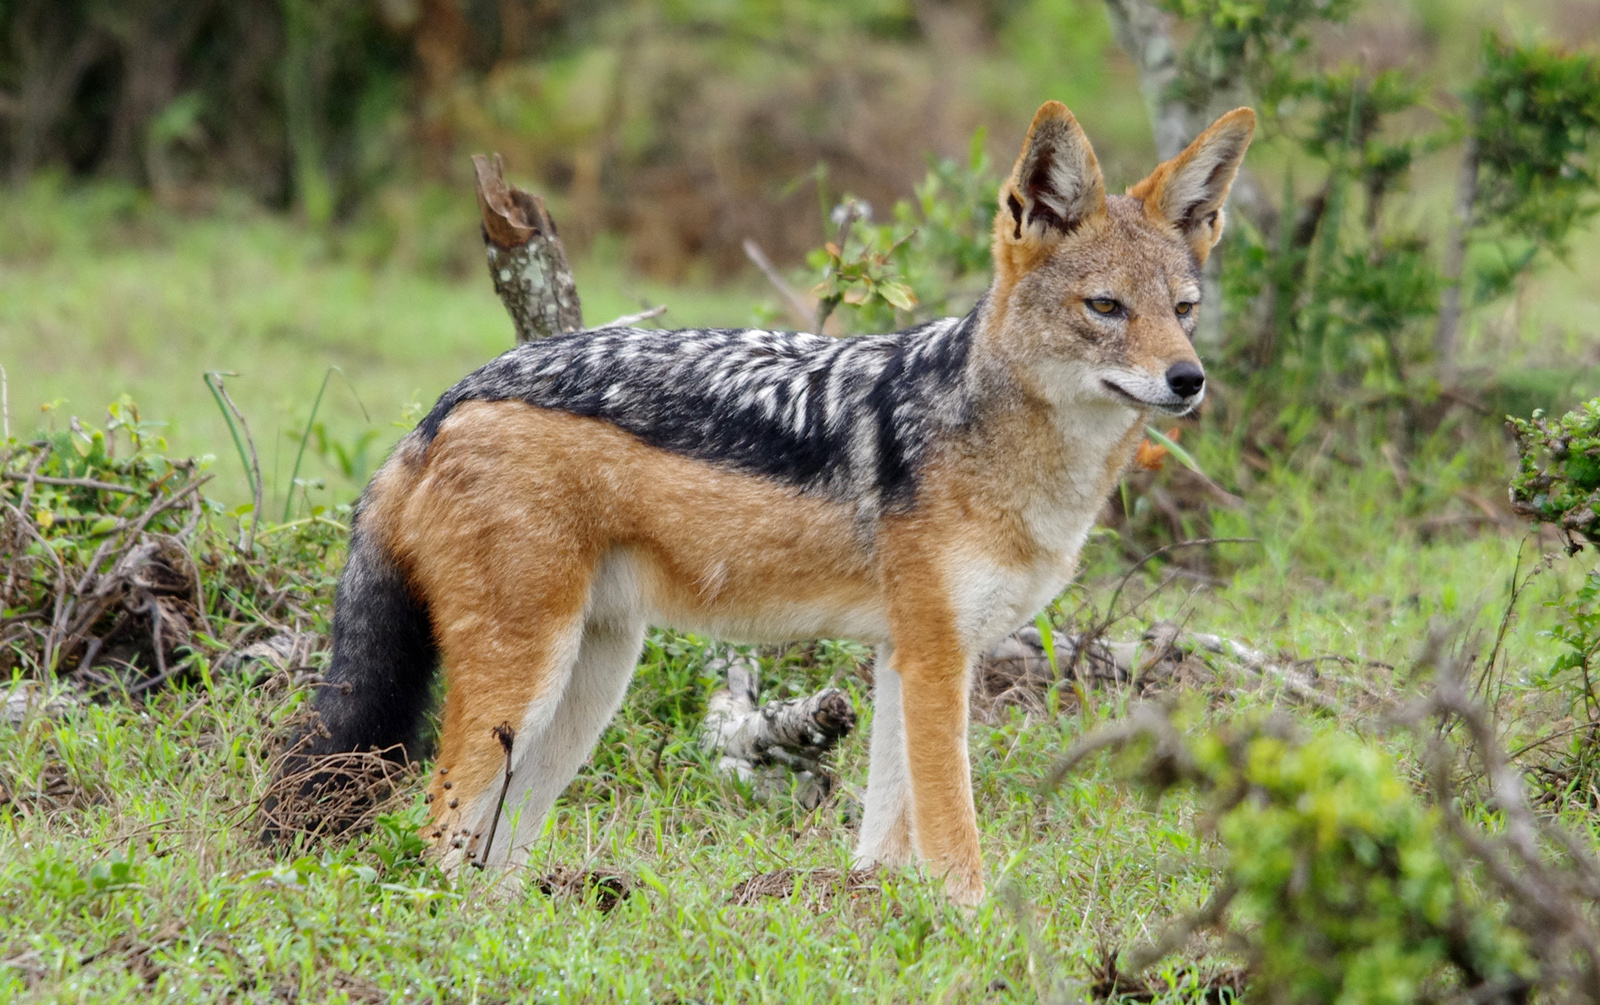 Animal jackal: description and lifestyle 27